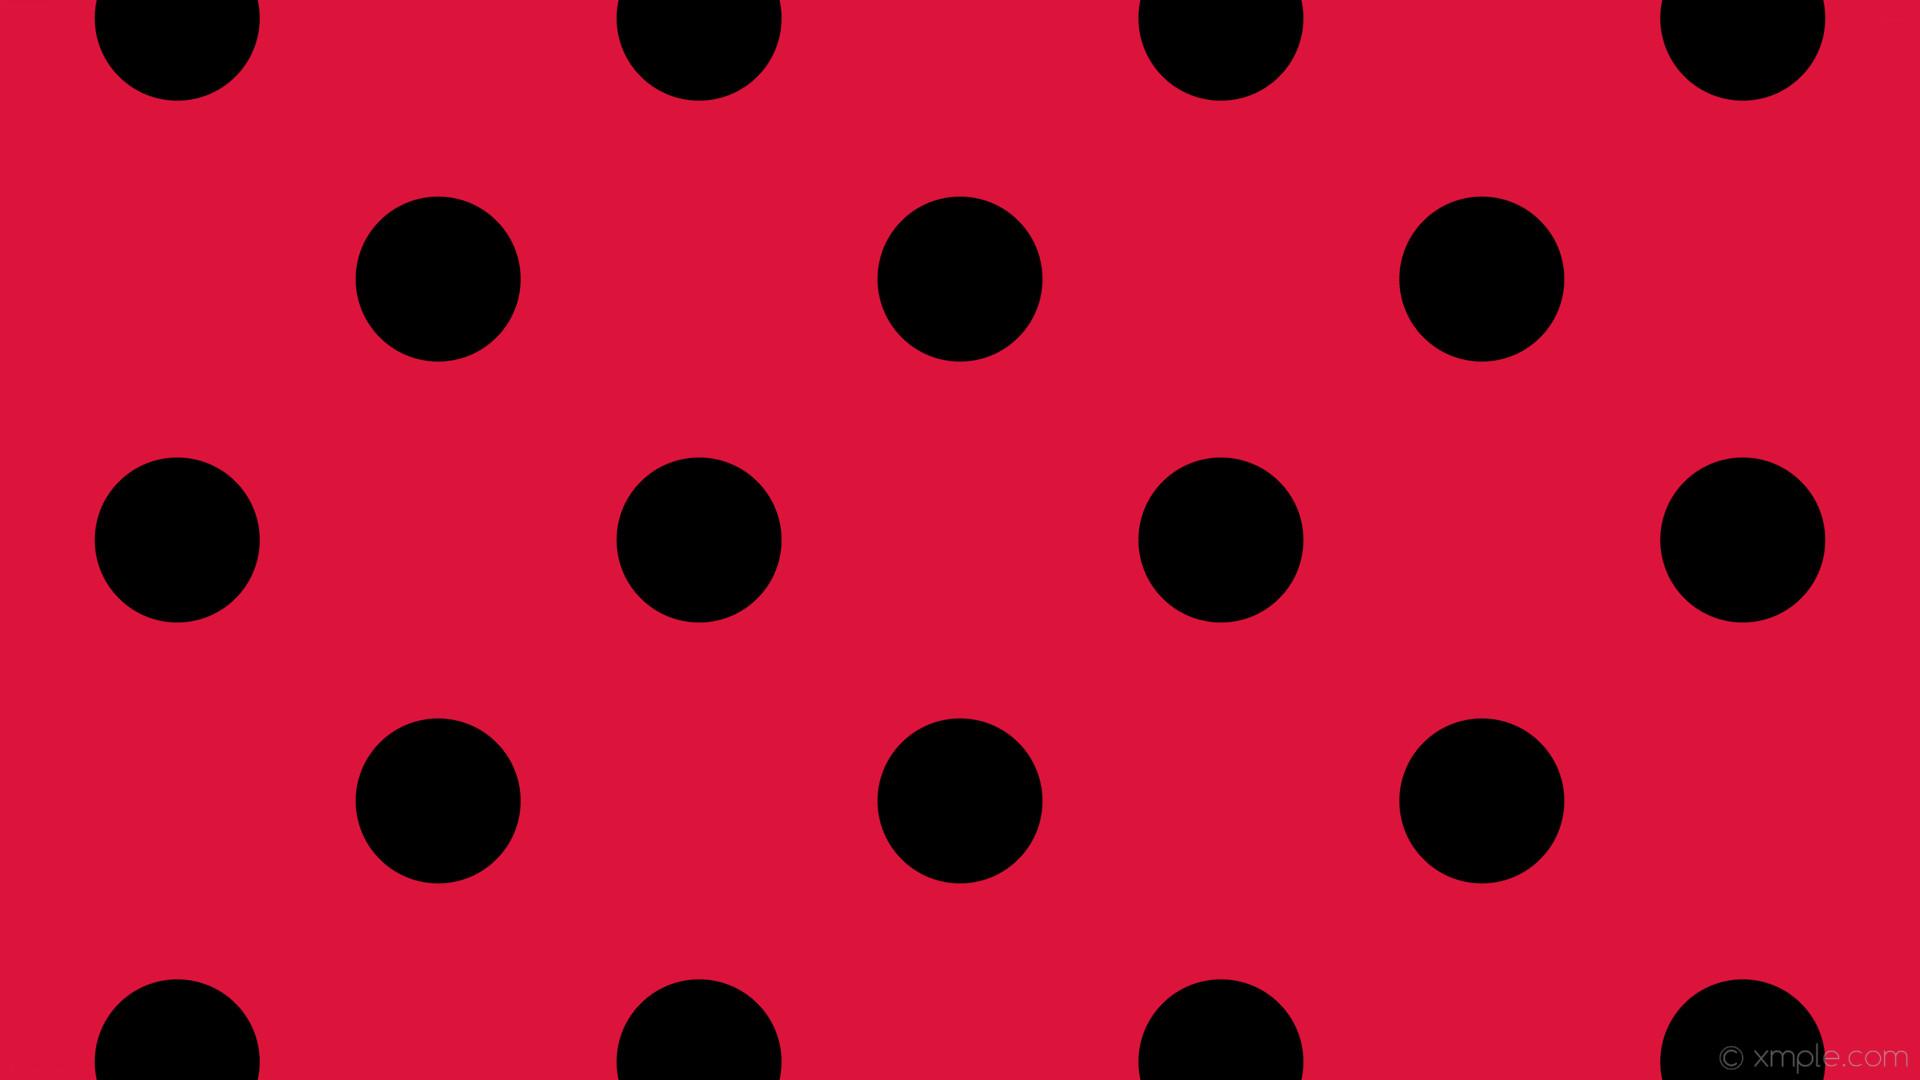 wallpaper red polka dots black spots crimson #dc143c #000000 225° 165px  369px